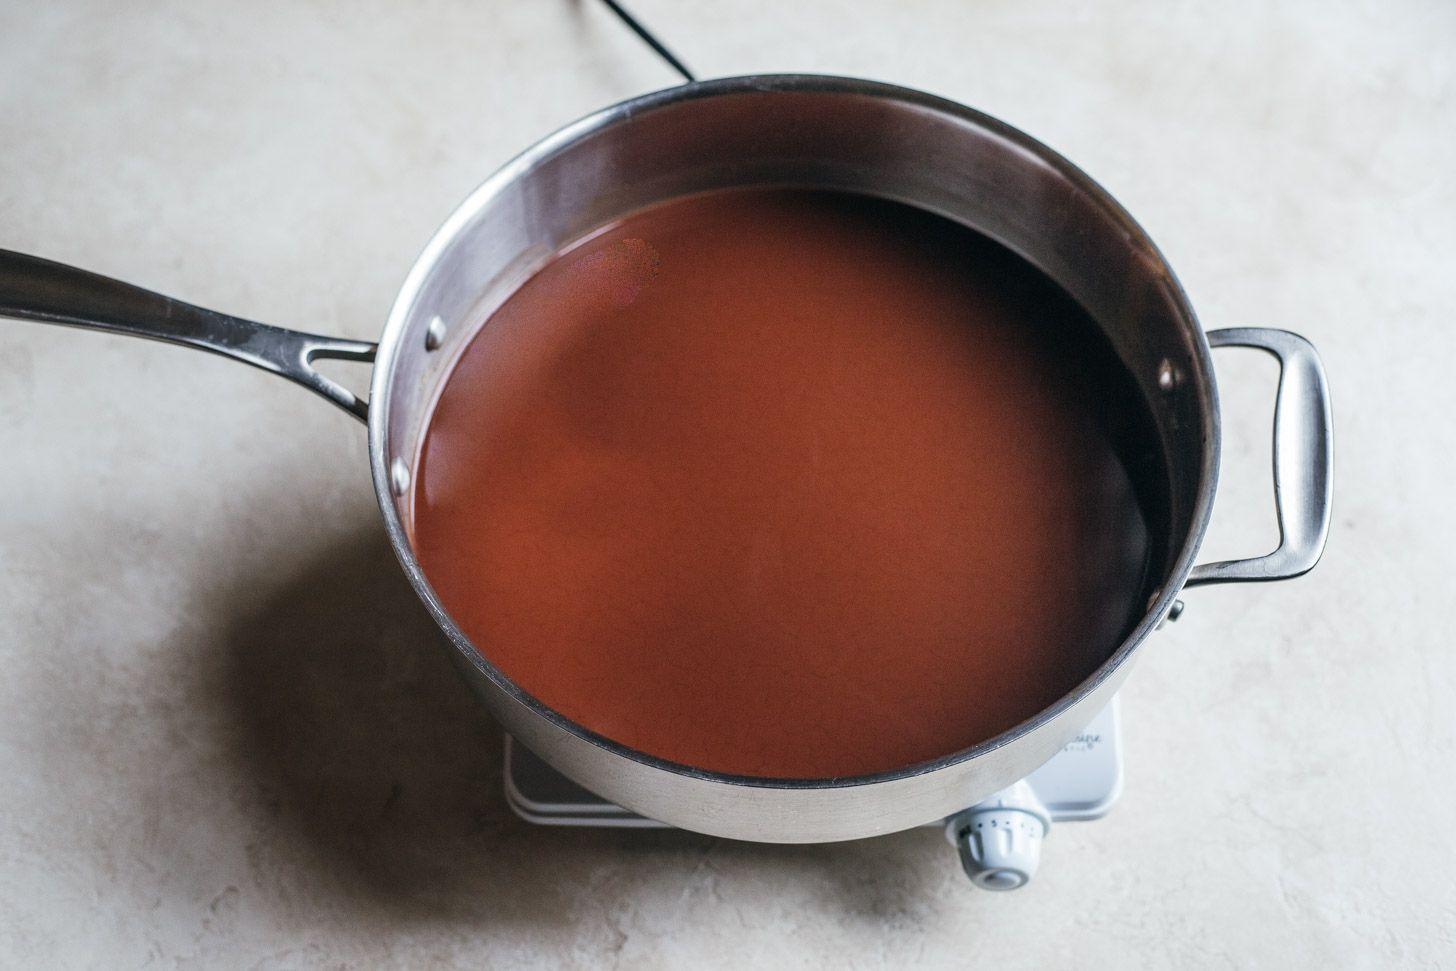 Stir in cocoa powder